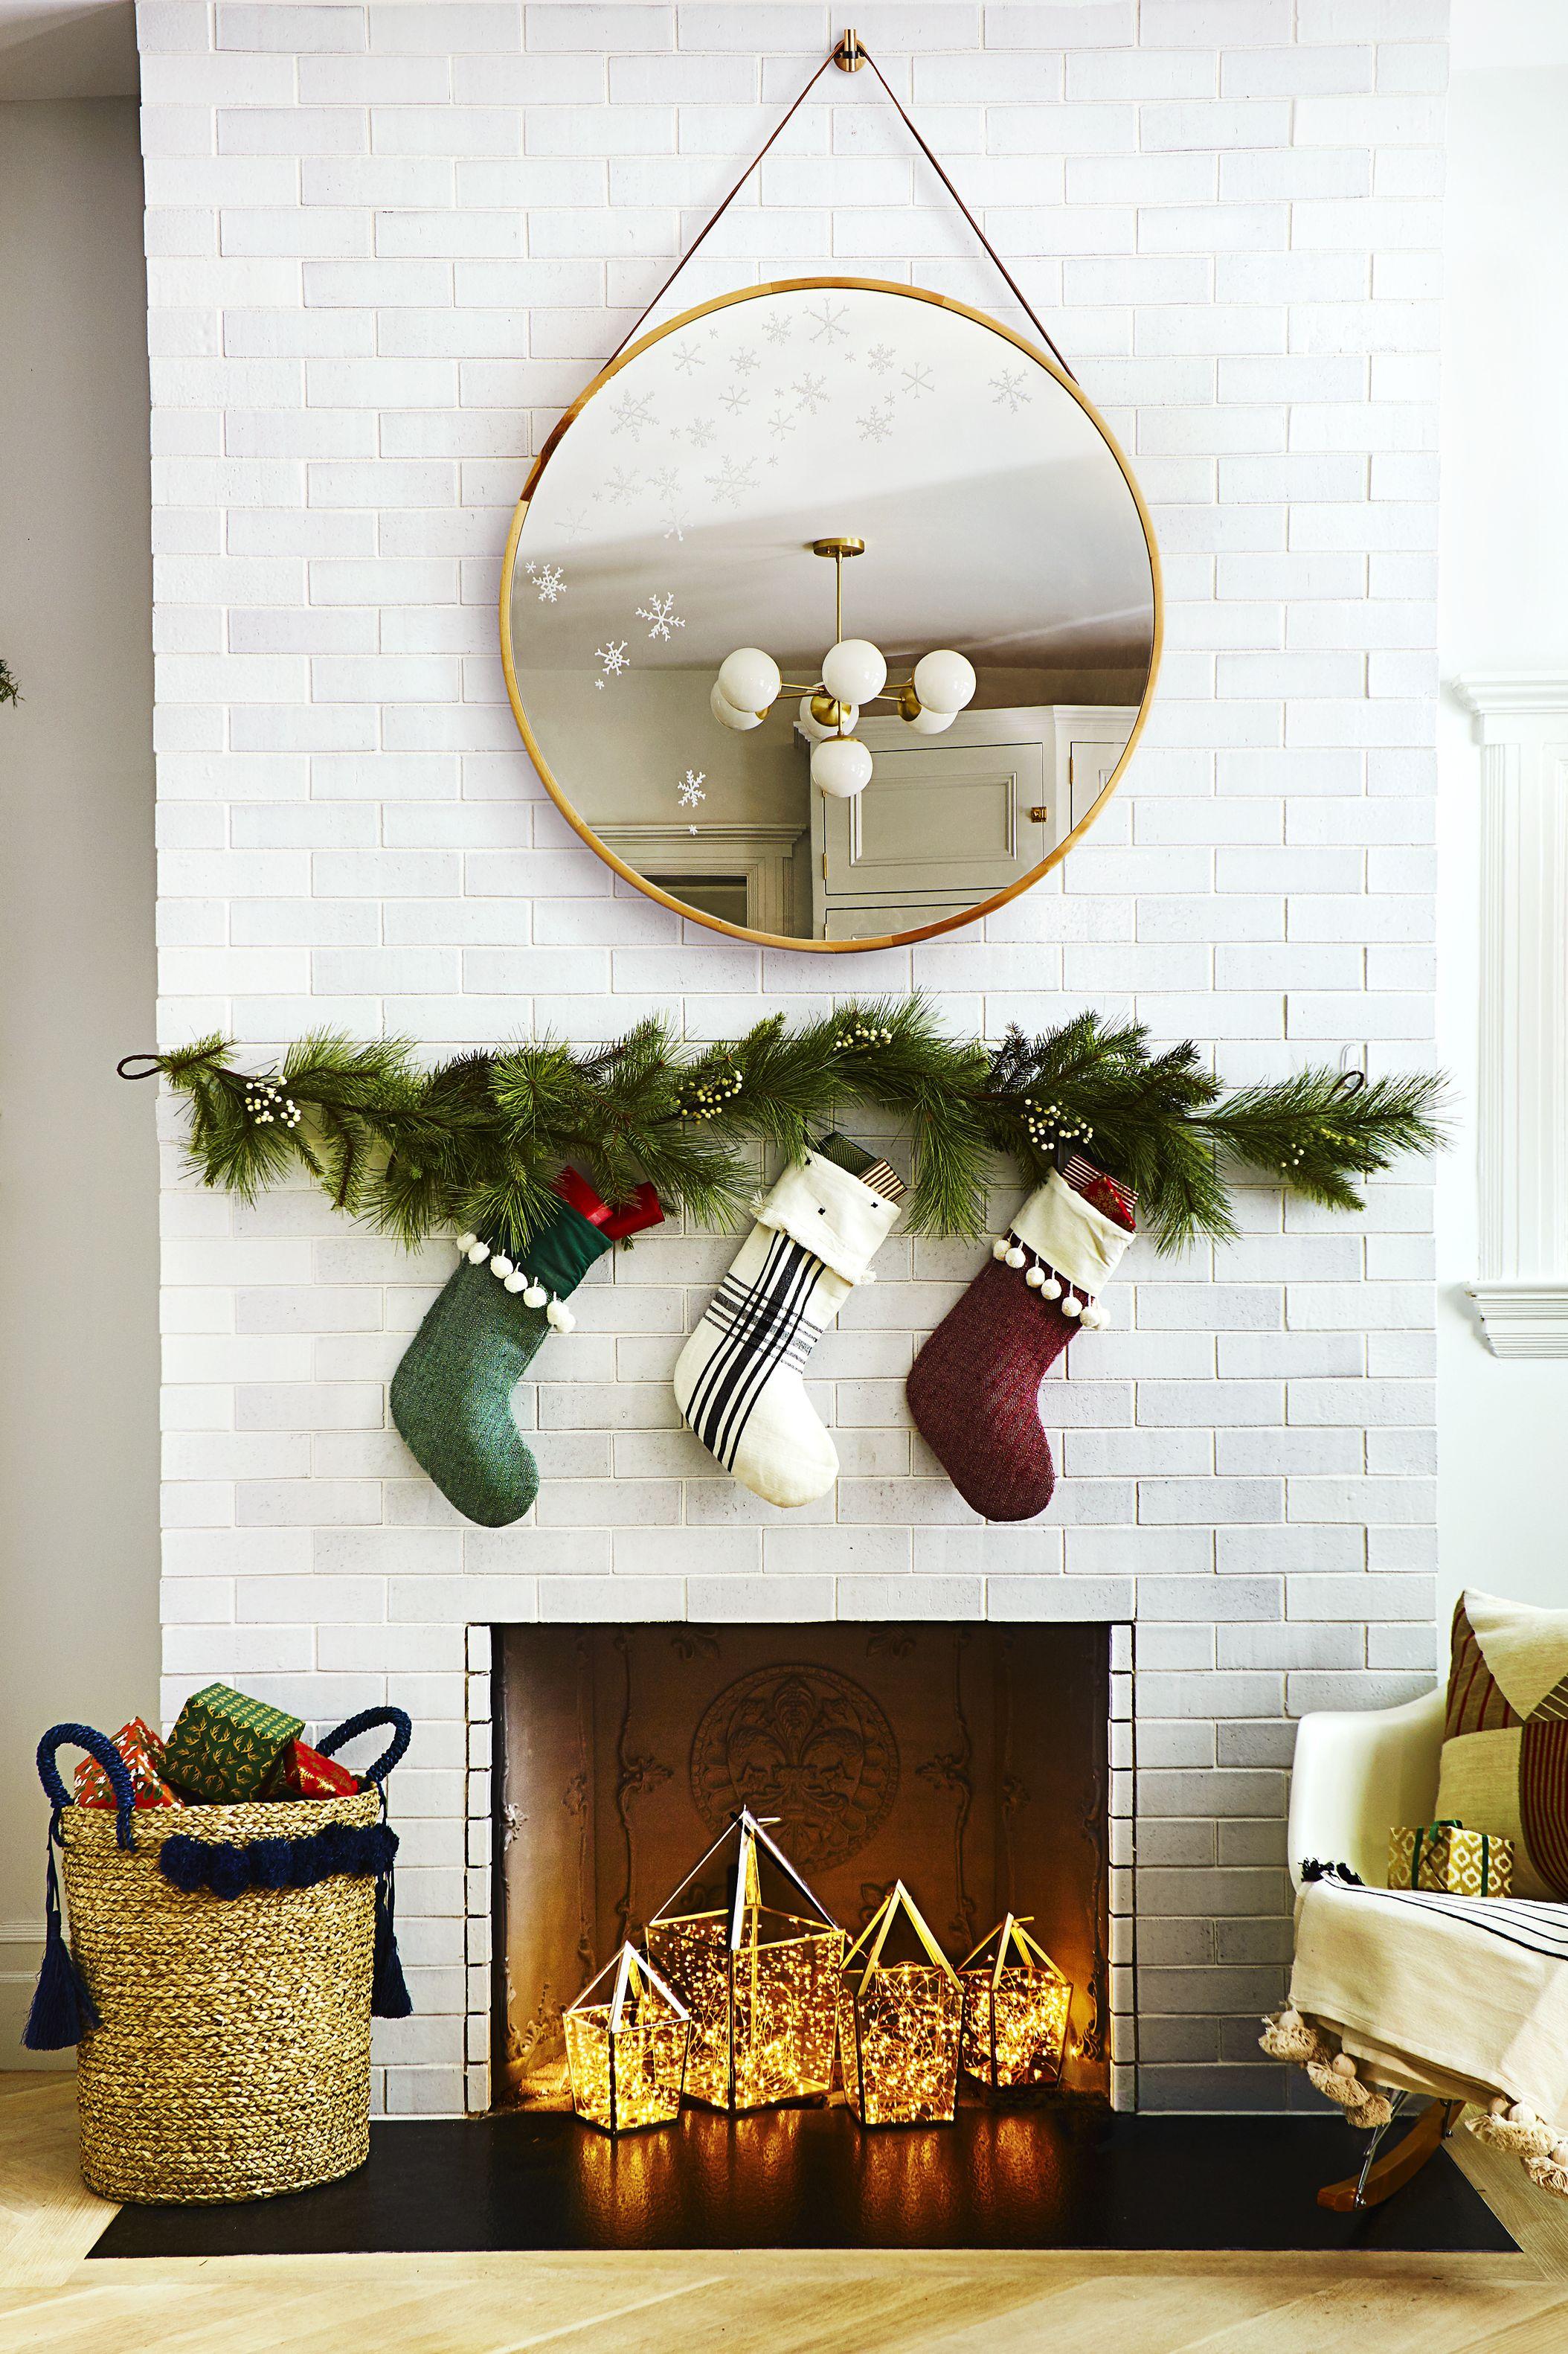 Fireplace - Christmas Decoration Ideas